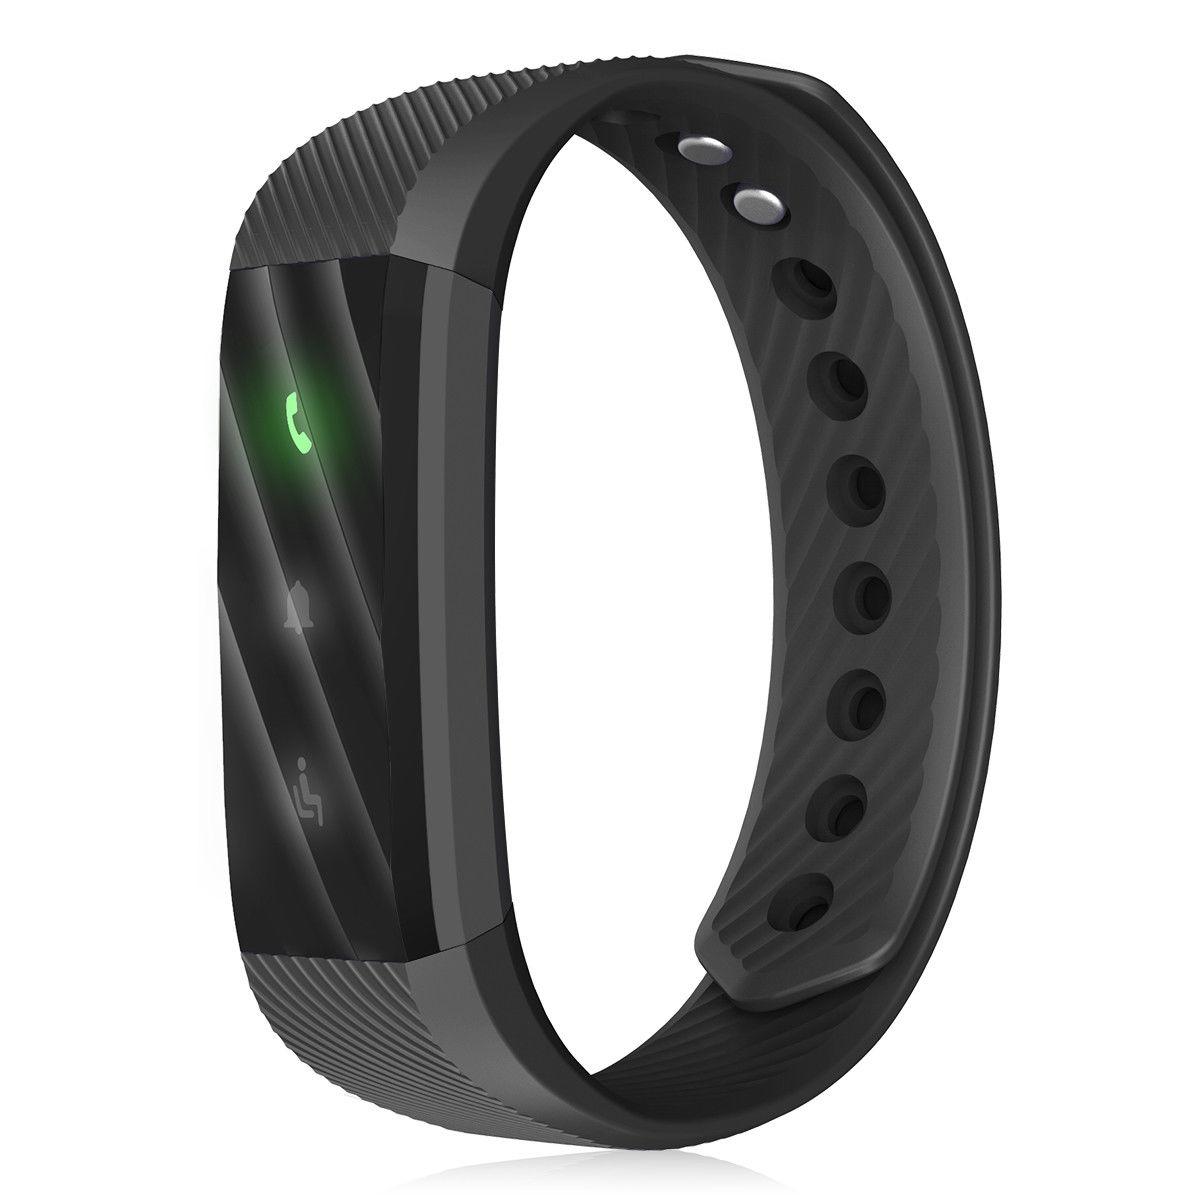 Smartband con pulsómetro por solo 3.99€